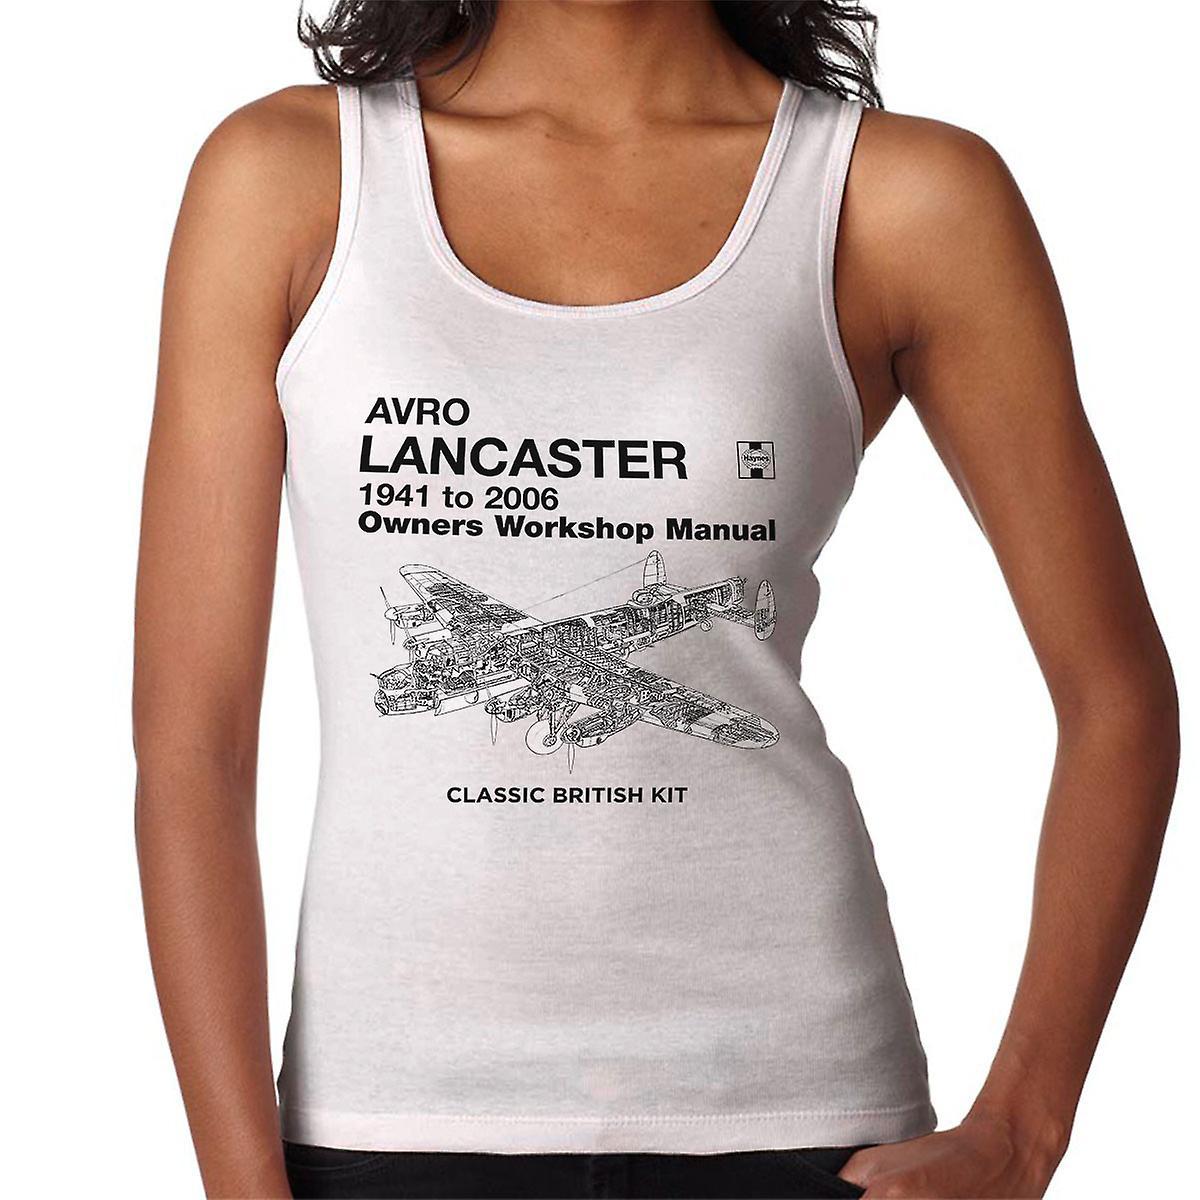 Haynes Owners Workshop Manual Arvo Lancaster 1941 to 2006 Women's Vest